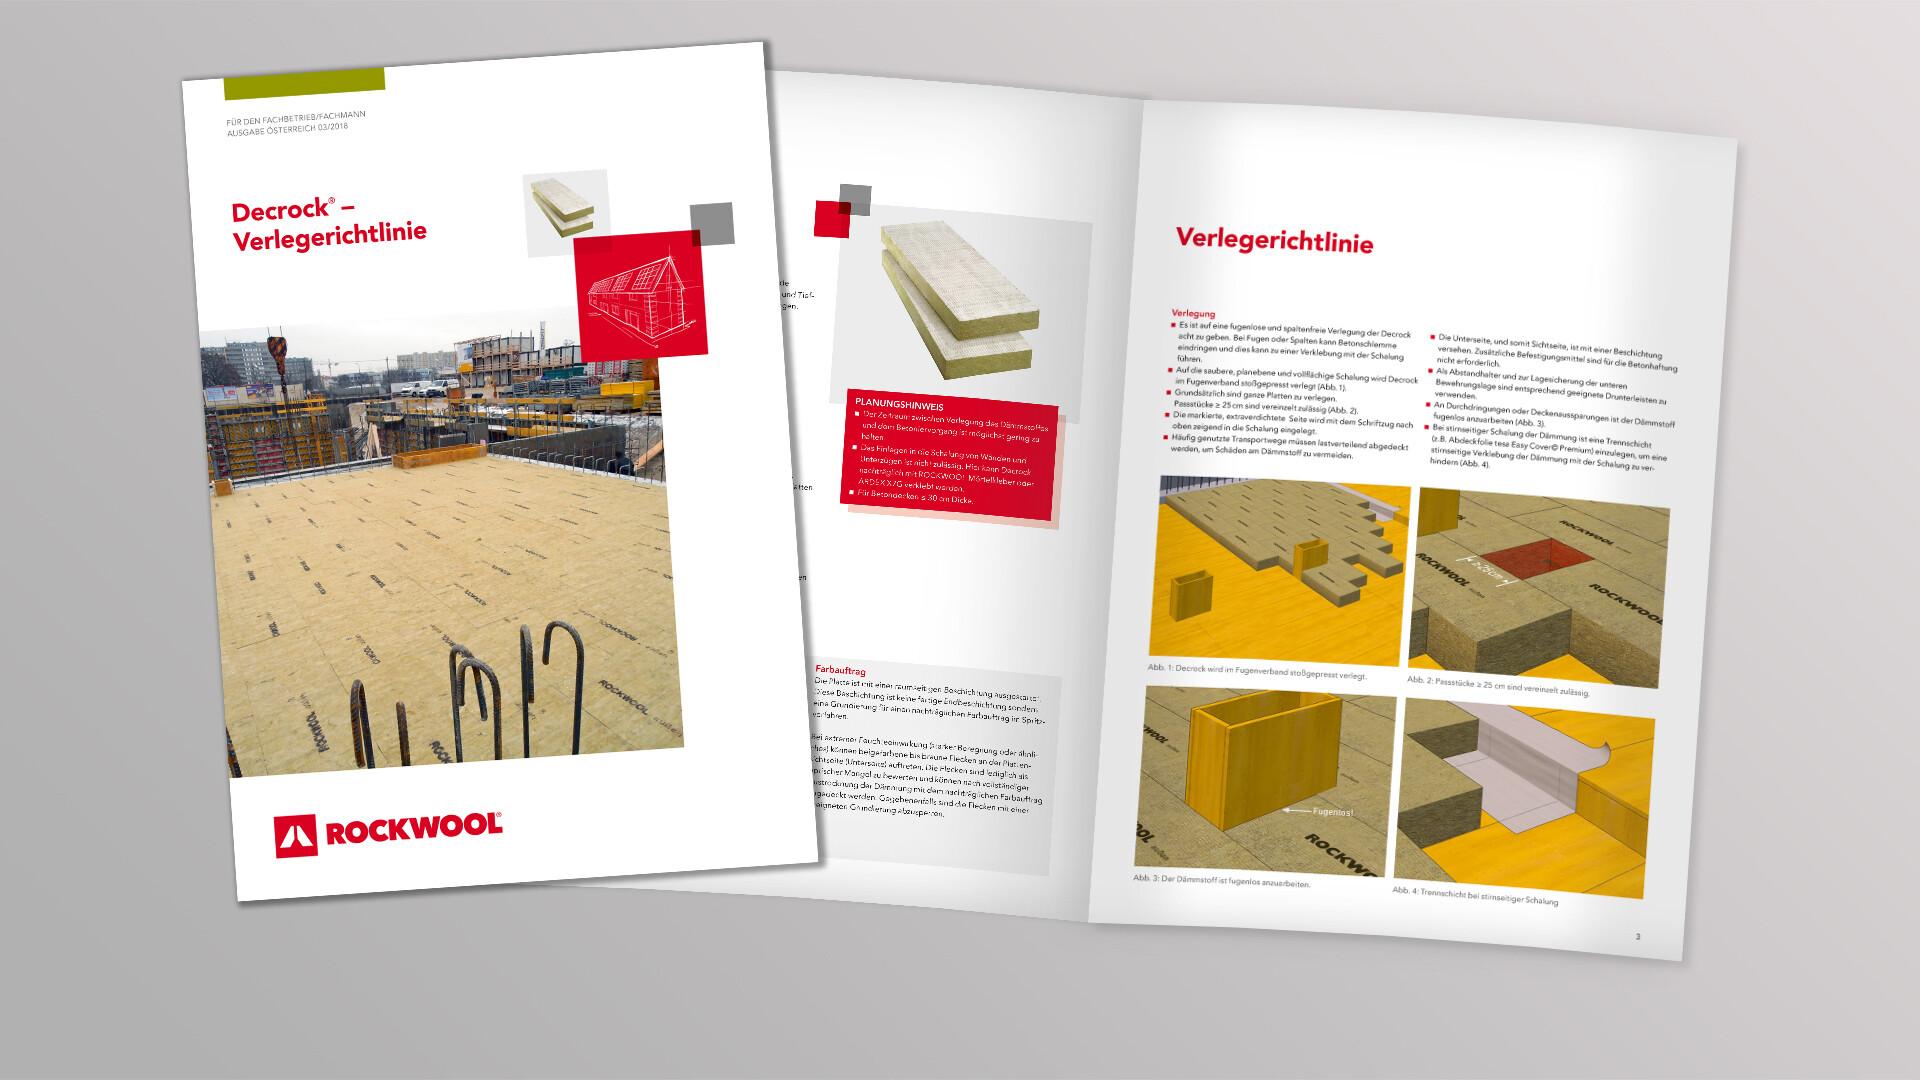 brochure, thumbnail, broschüre decrock verlegerichtlinie, austria